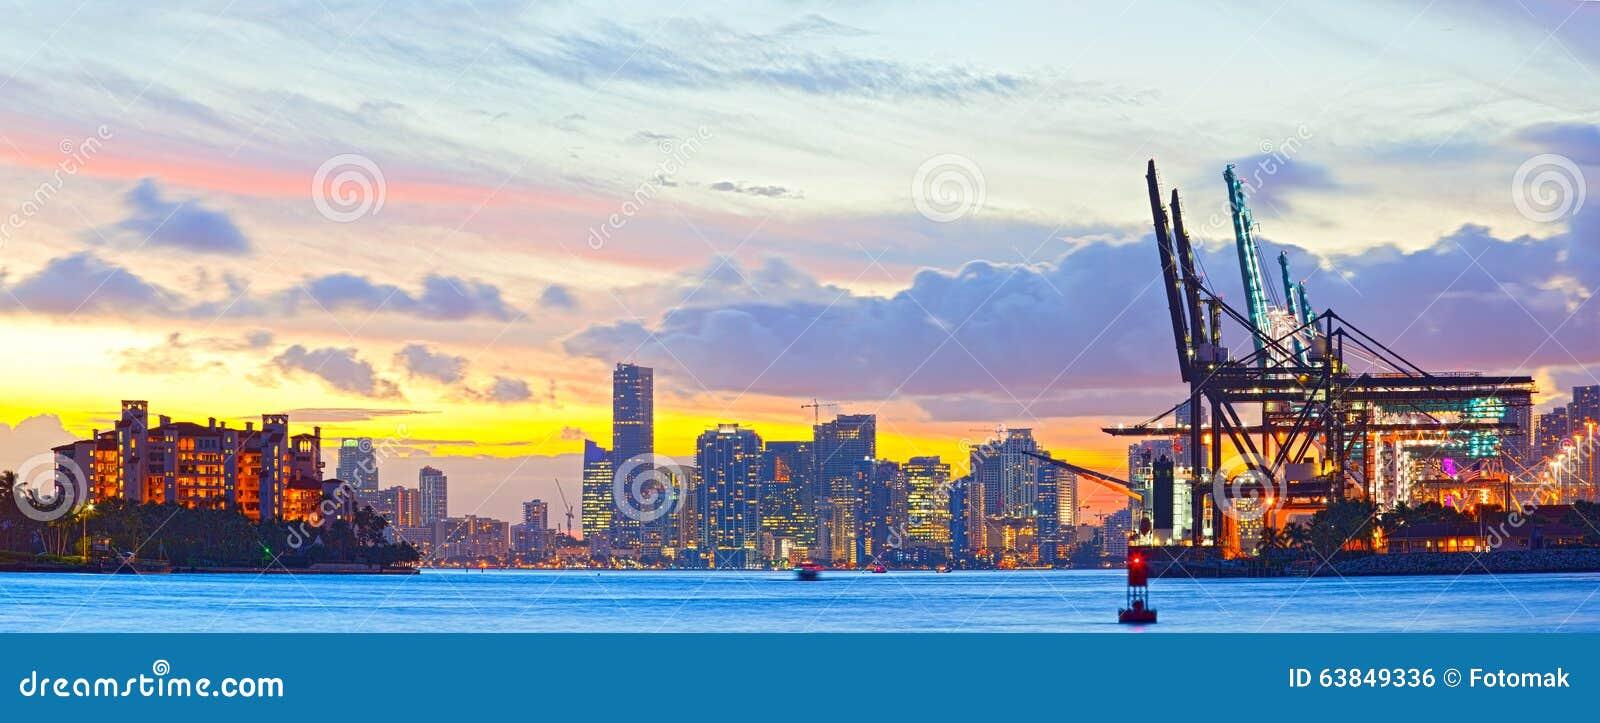 Панорама захода солнца порта Майами, острова Fisher и городского